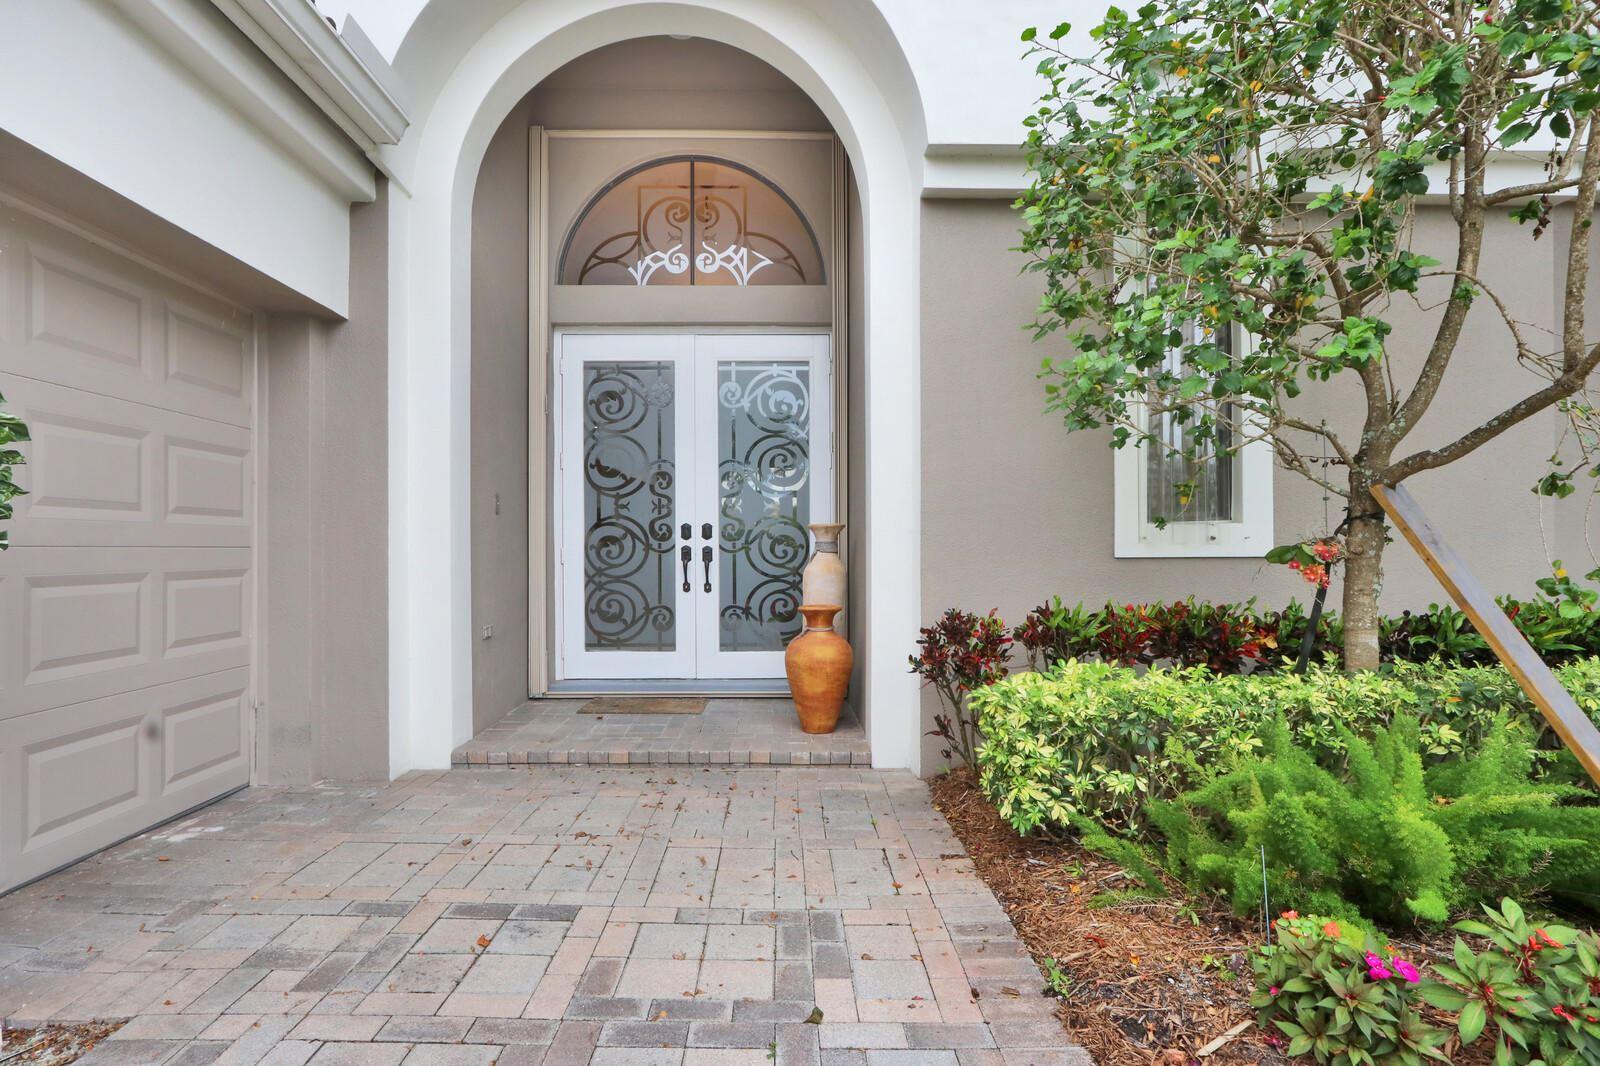 Photo of 7661 Blue Heron Way, West Palm Beach, FL 33412 (MLS # RX-10697168)